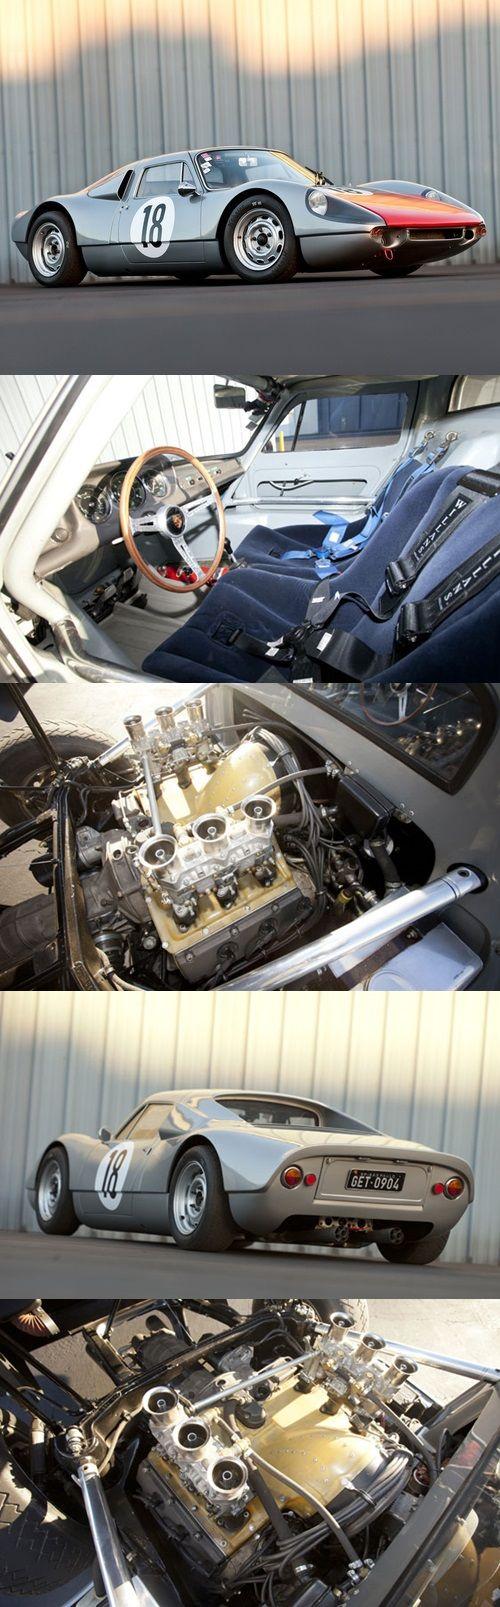 1963 Porsche 904/6 Carrera GTS